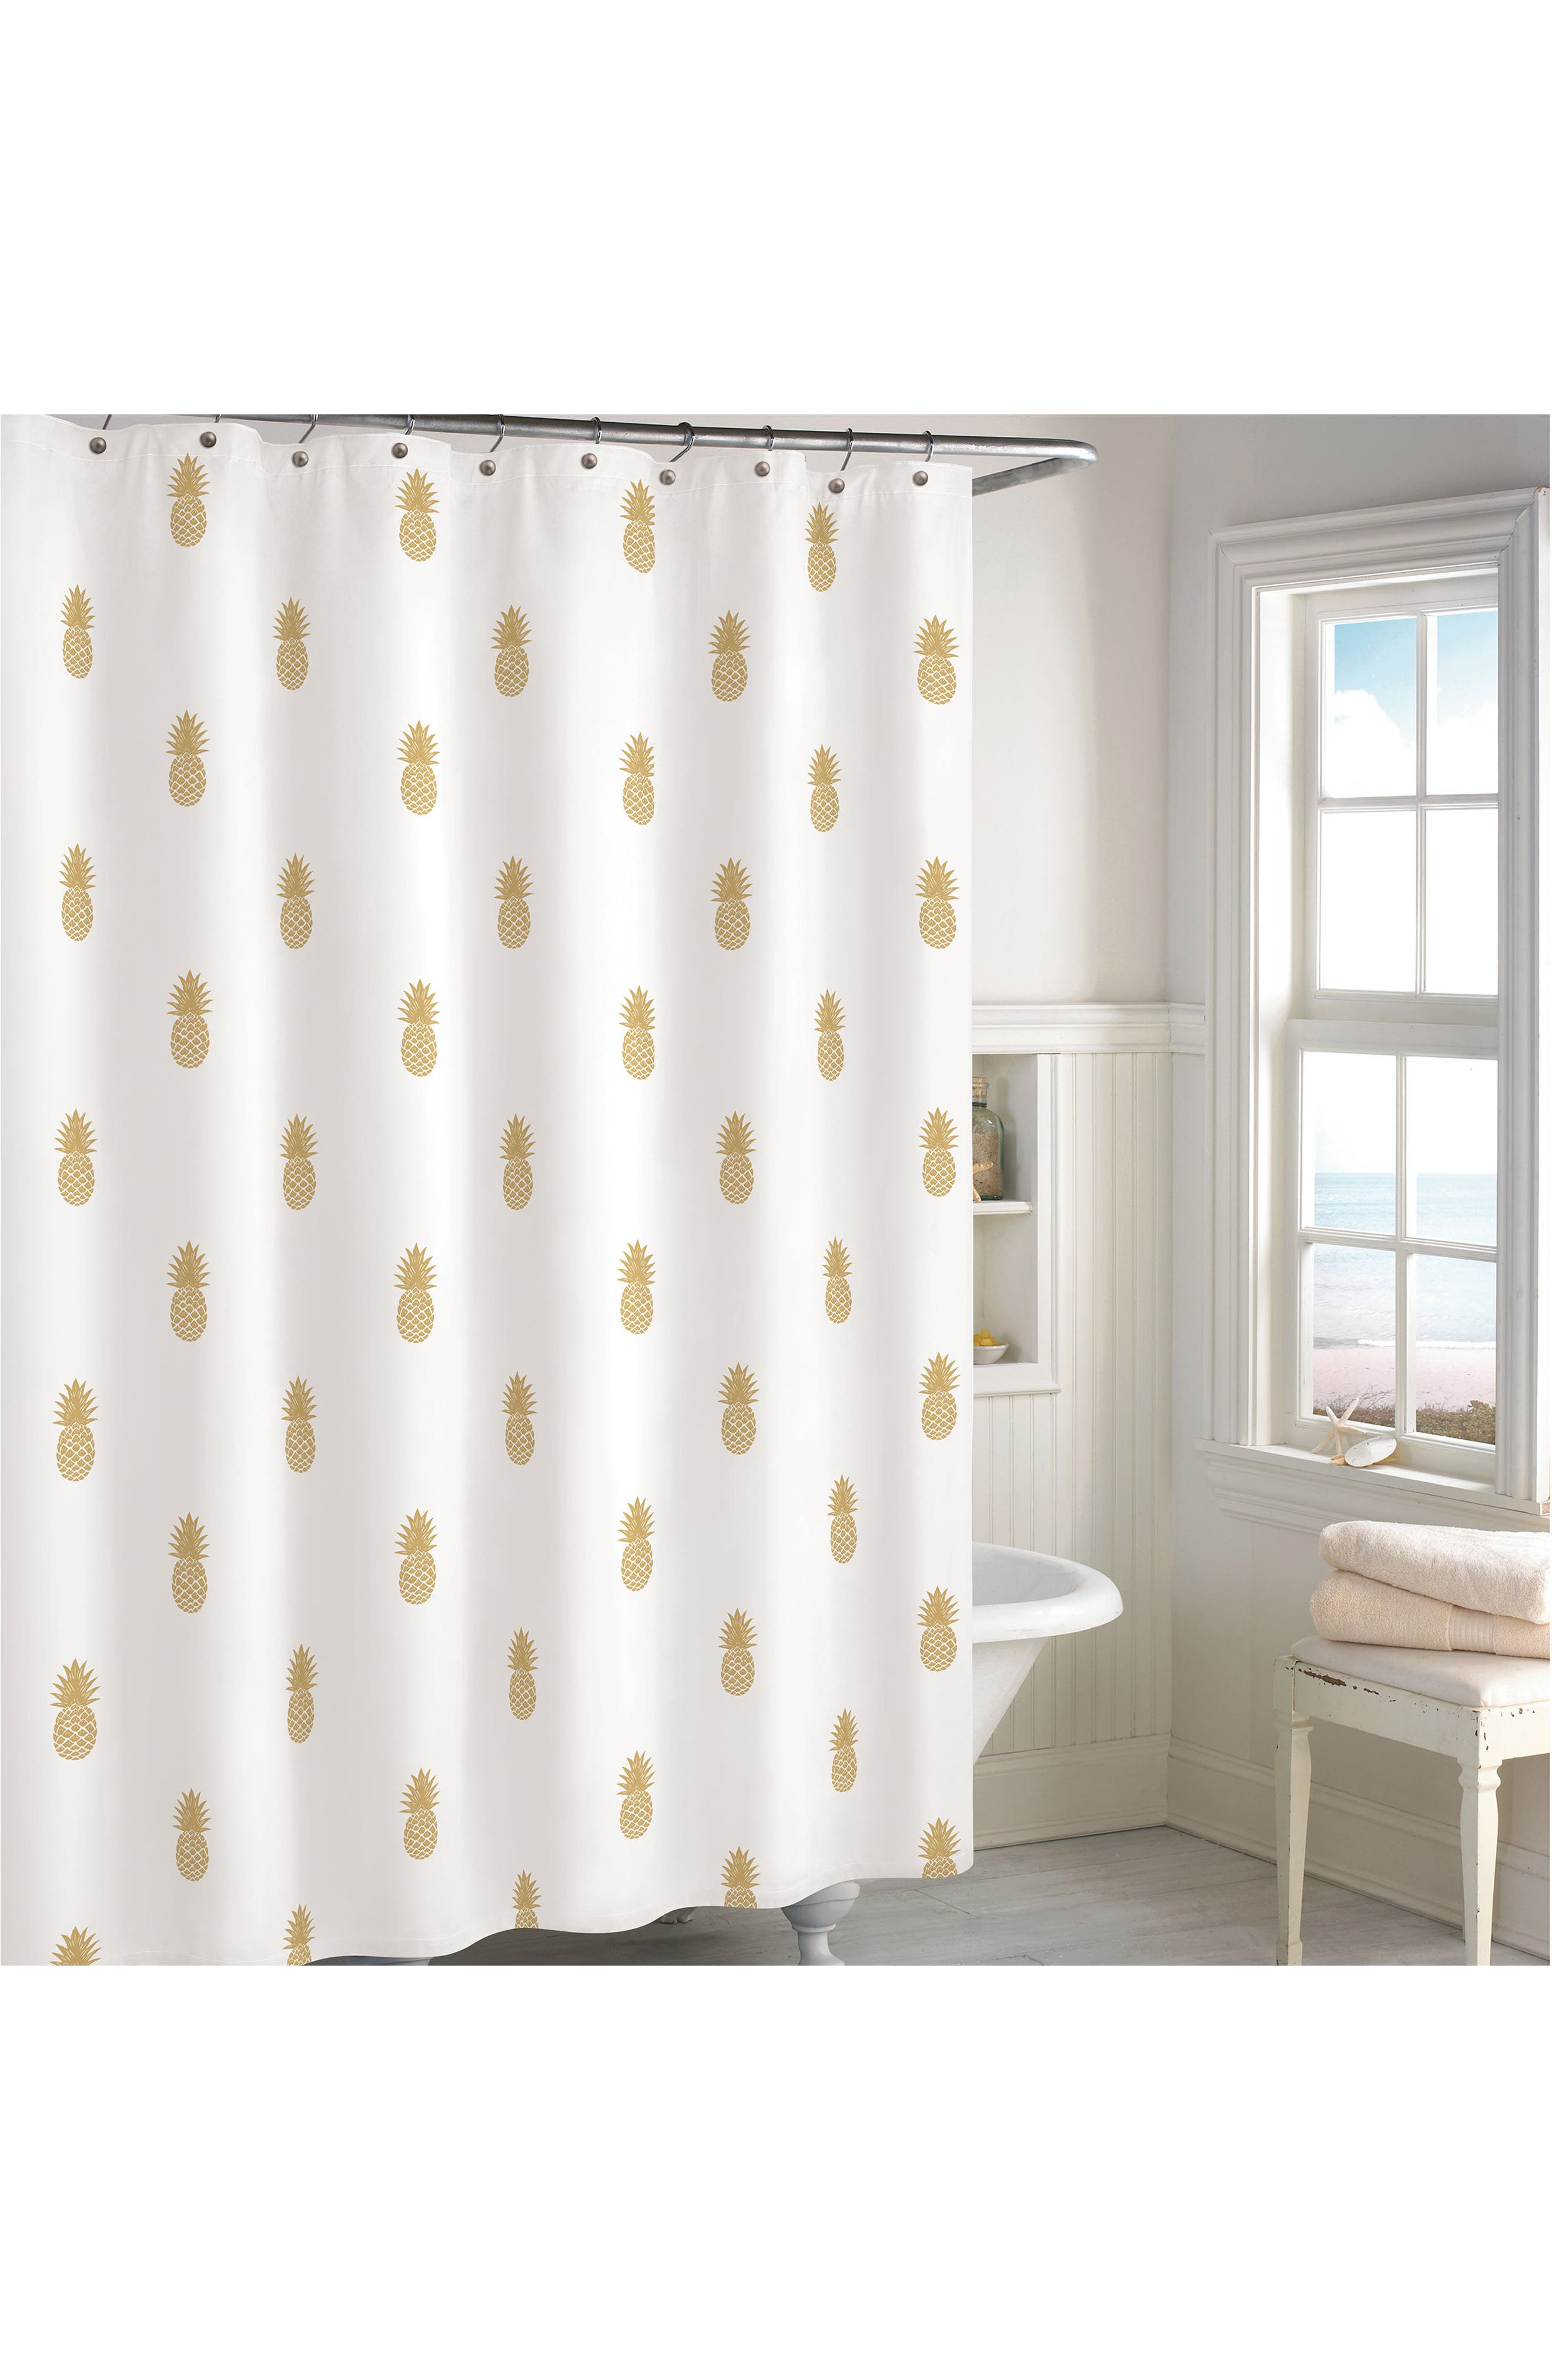 Golden Pineapple Shower Curtain, ...